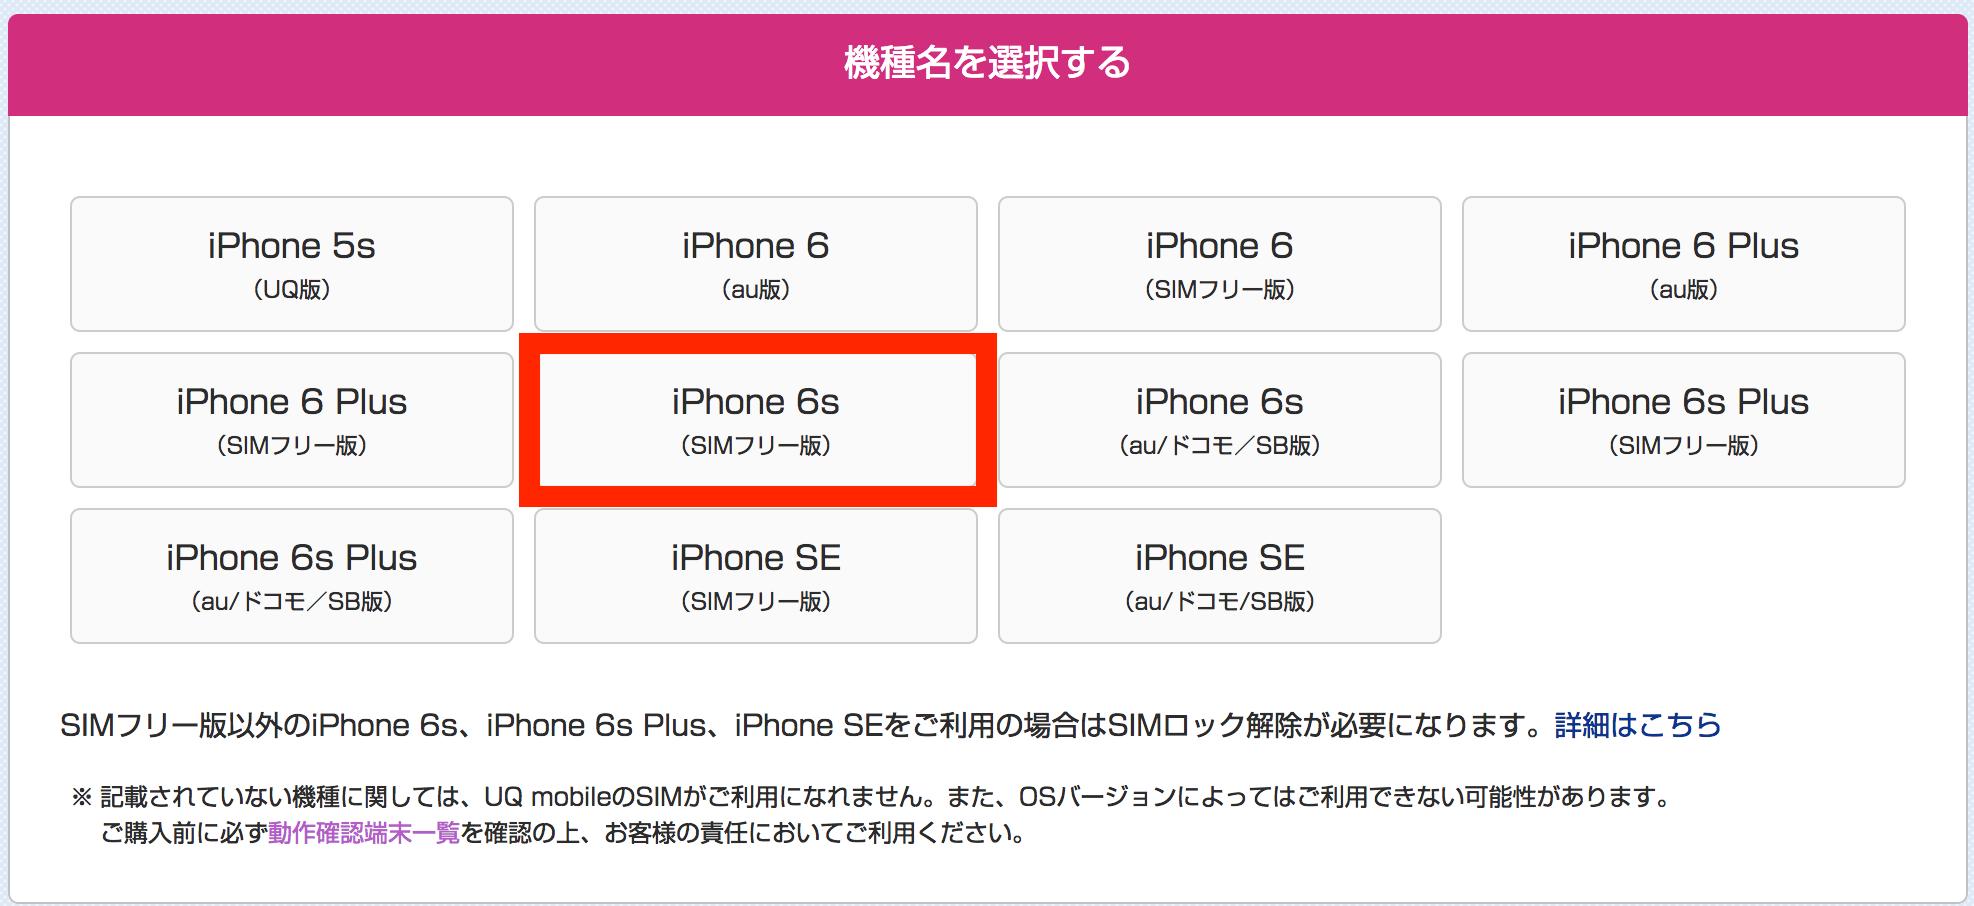 iPhone8用のUQモバイルSIMはiPhone6s用でOK